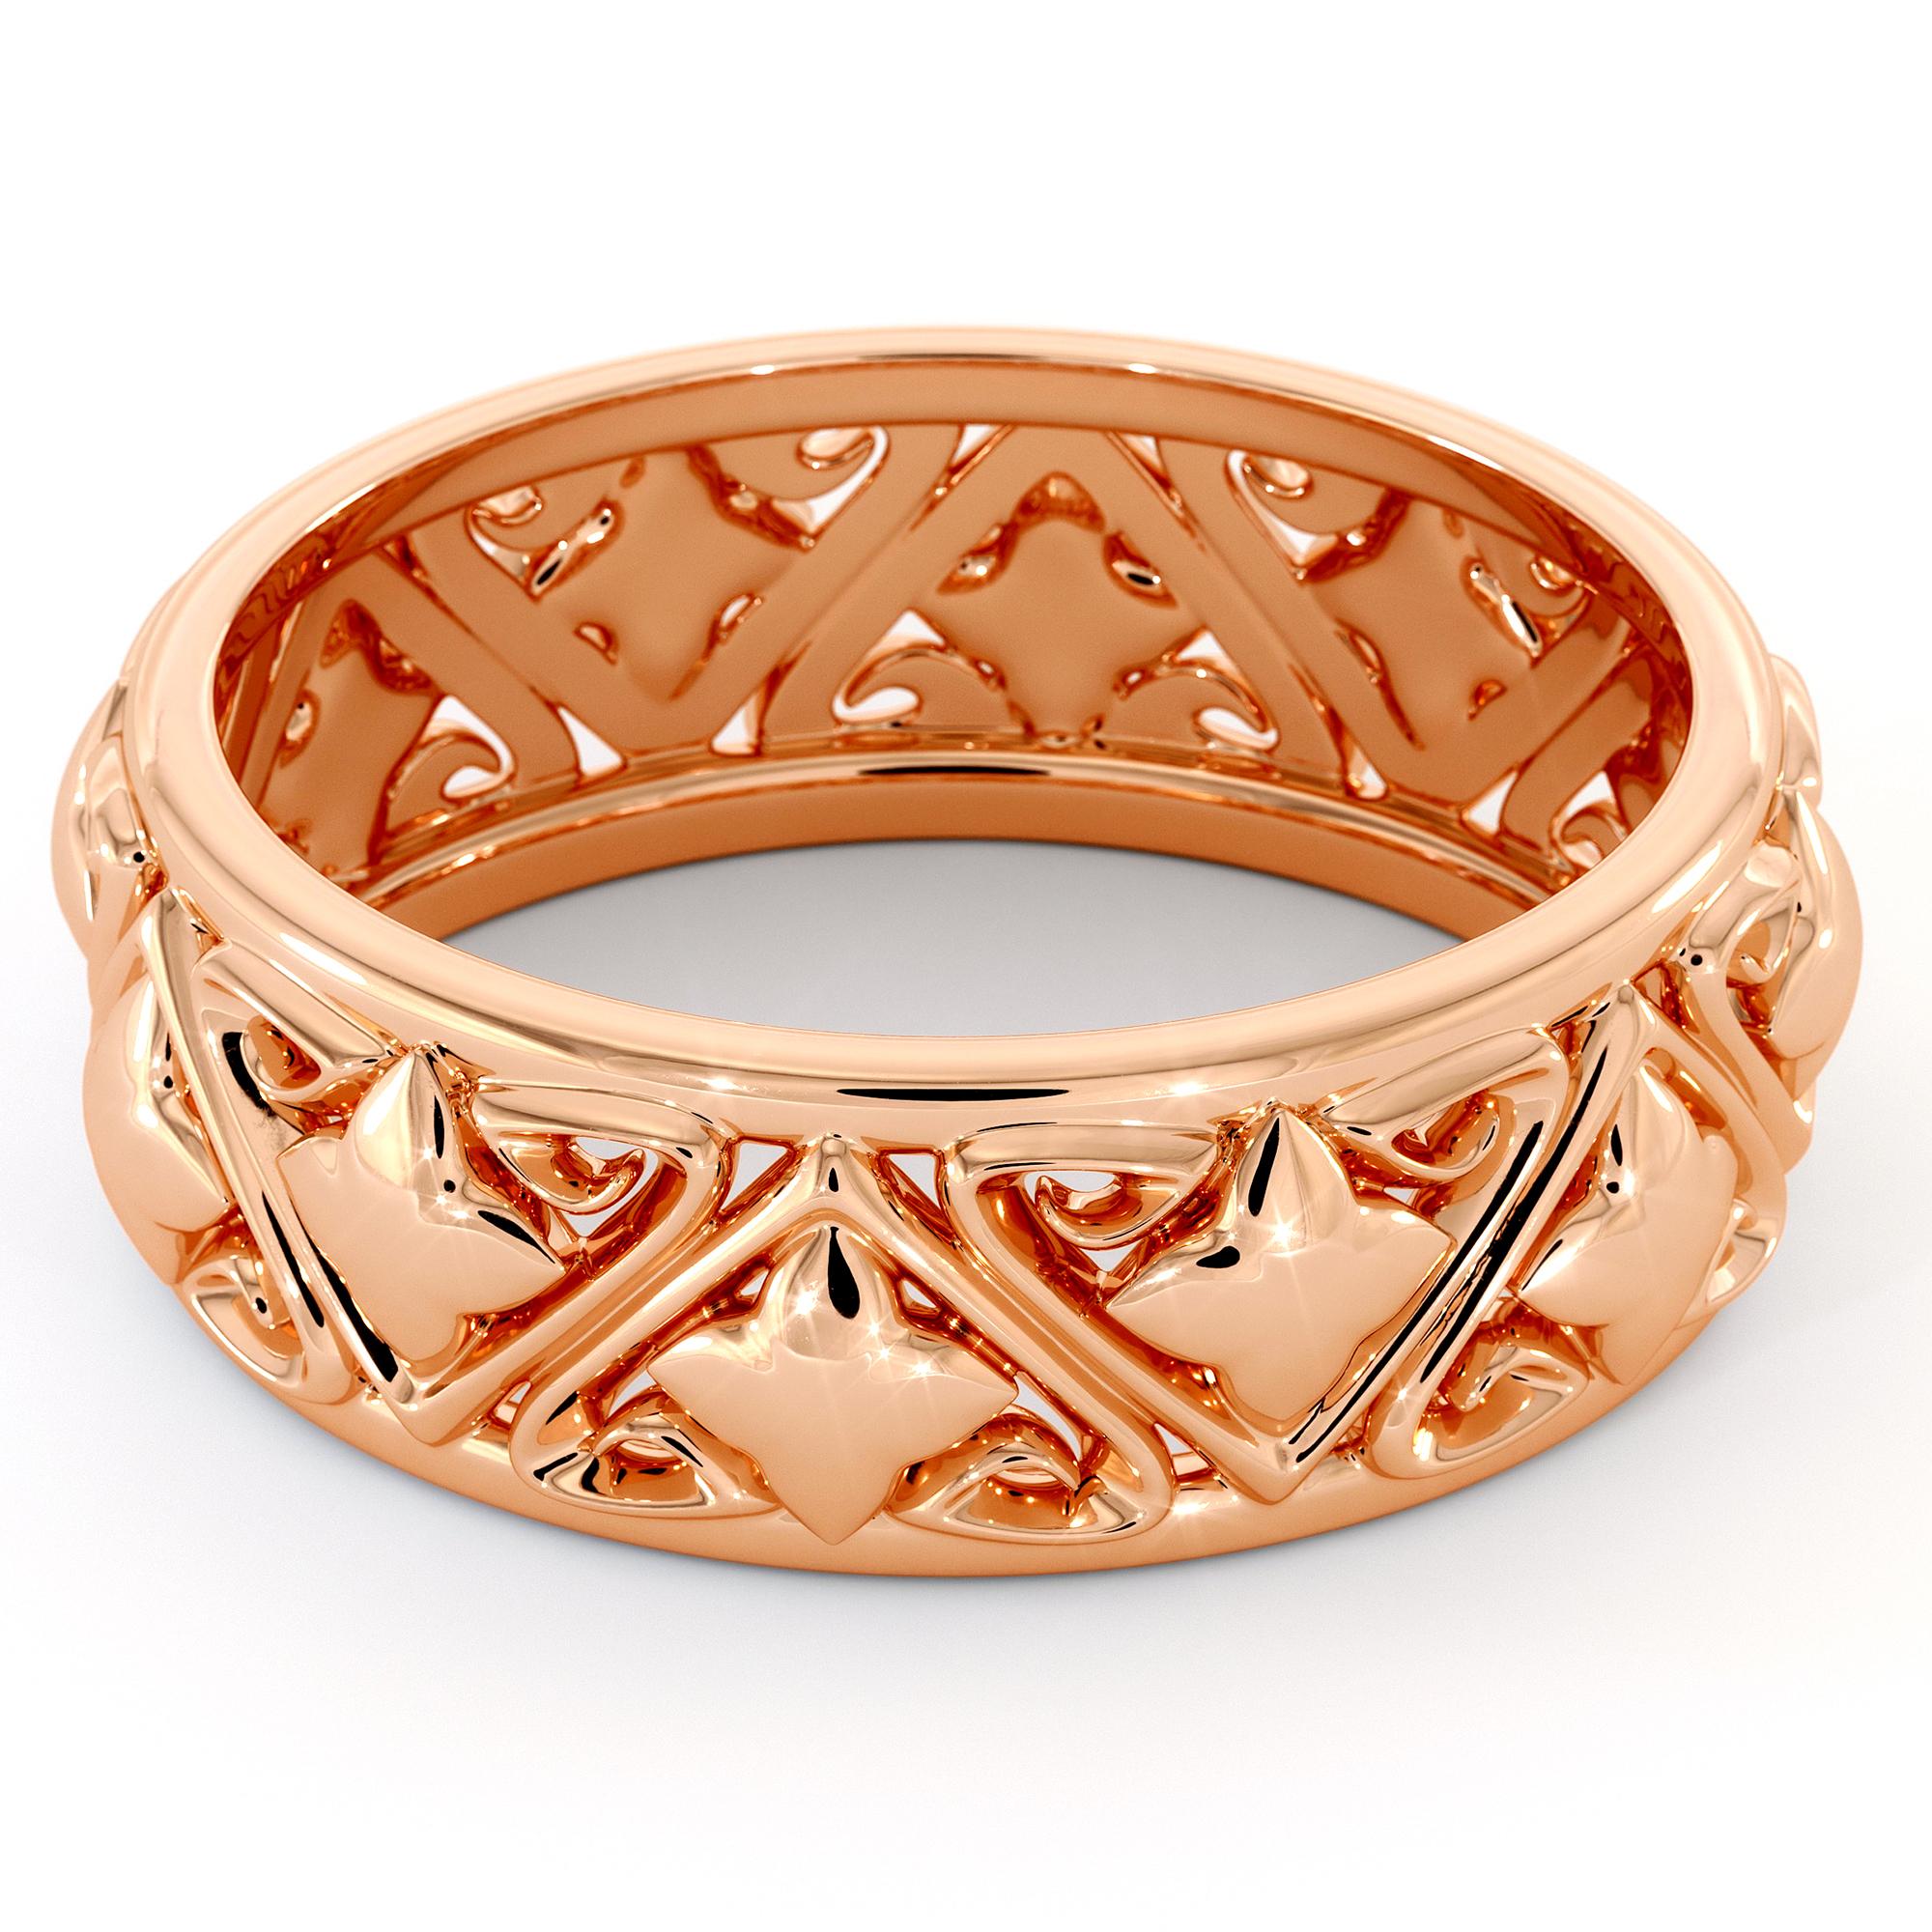 Wedding Band Mens Rose Gold Most Unique Mens Band Unique Filigree Ring